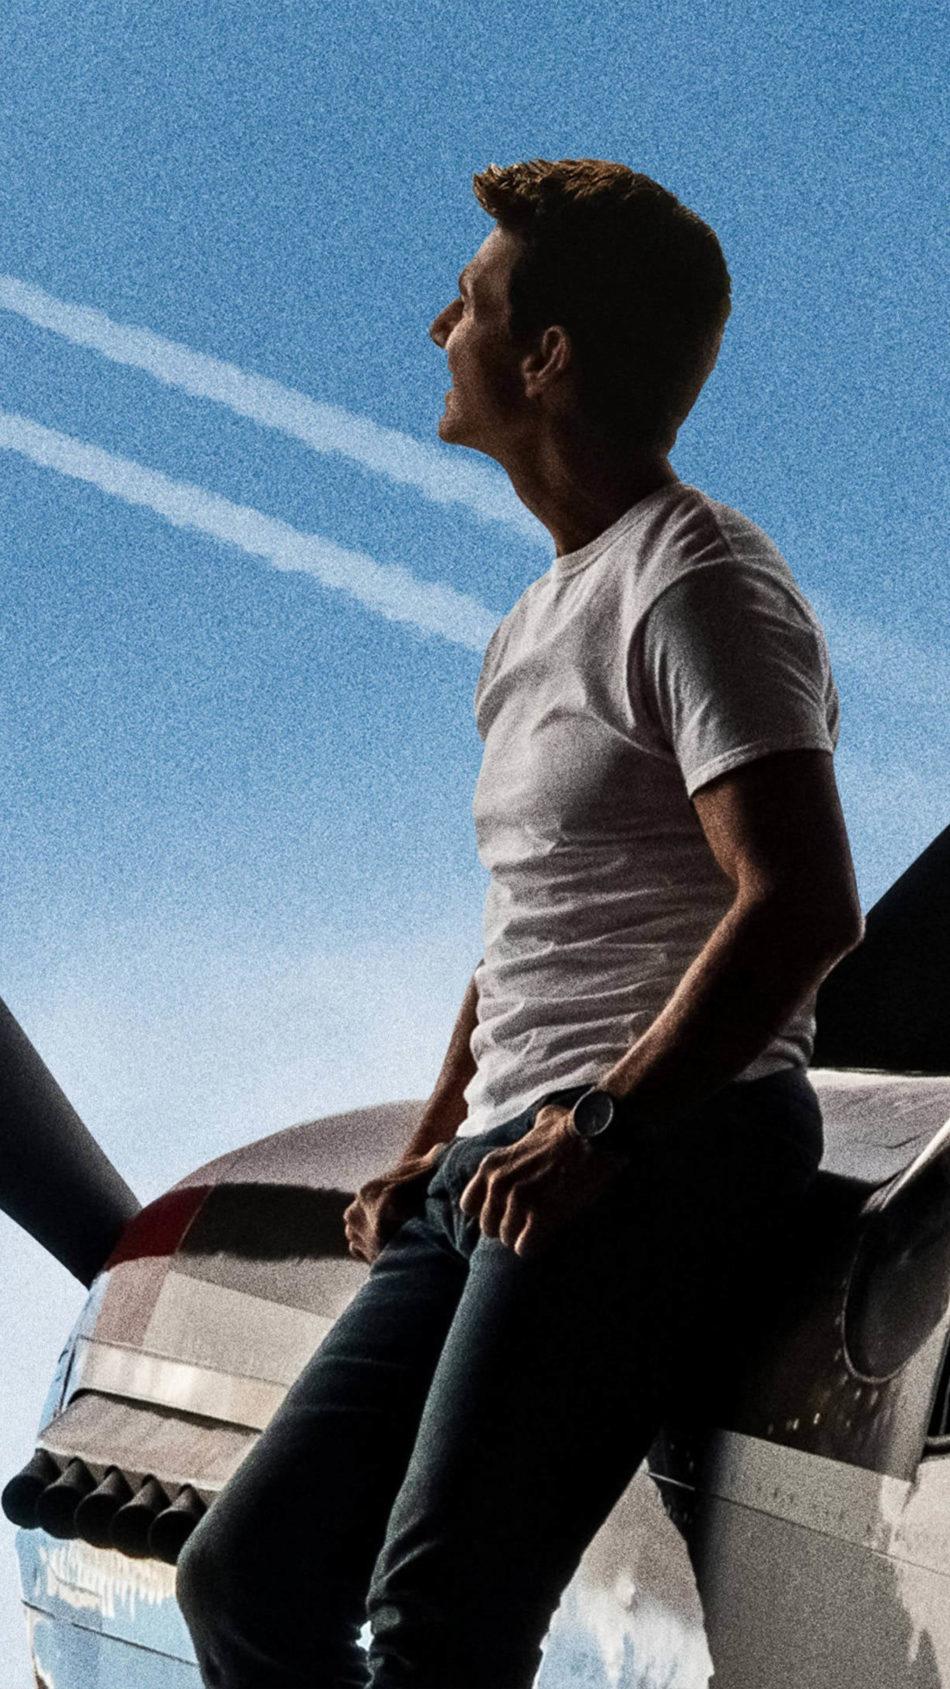 Top Gun Maverick Tom Cruise 4K Ultra HD Mobile Wallpaper